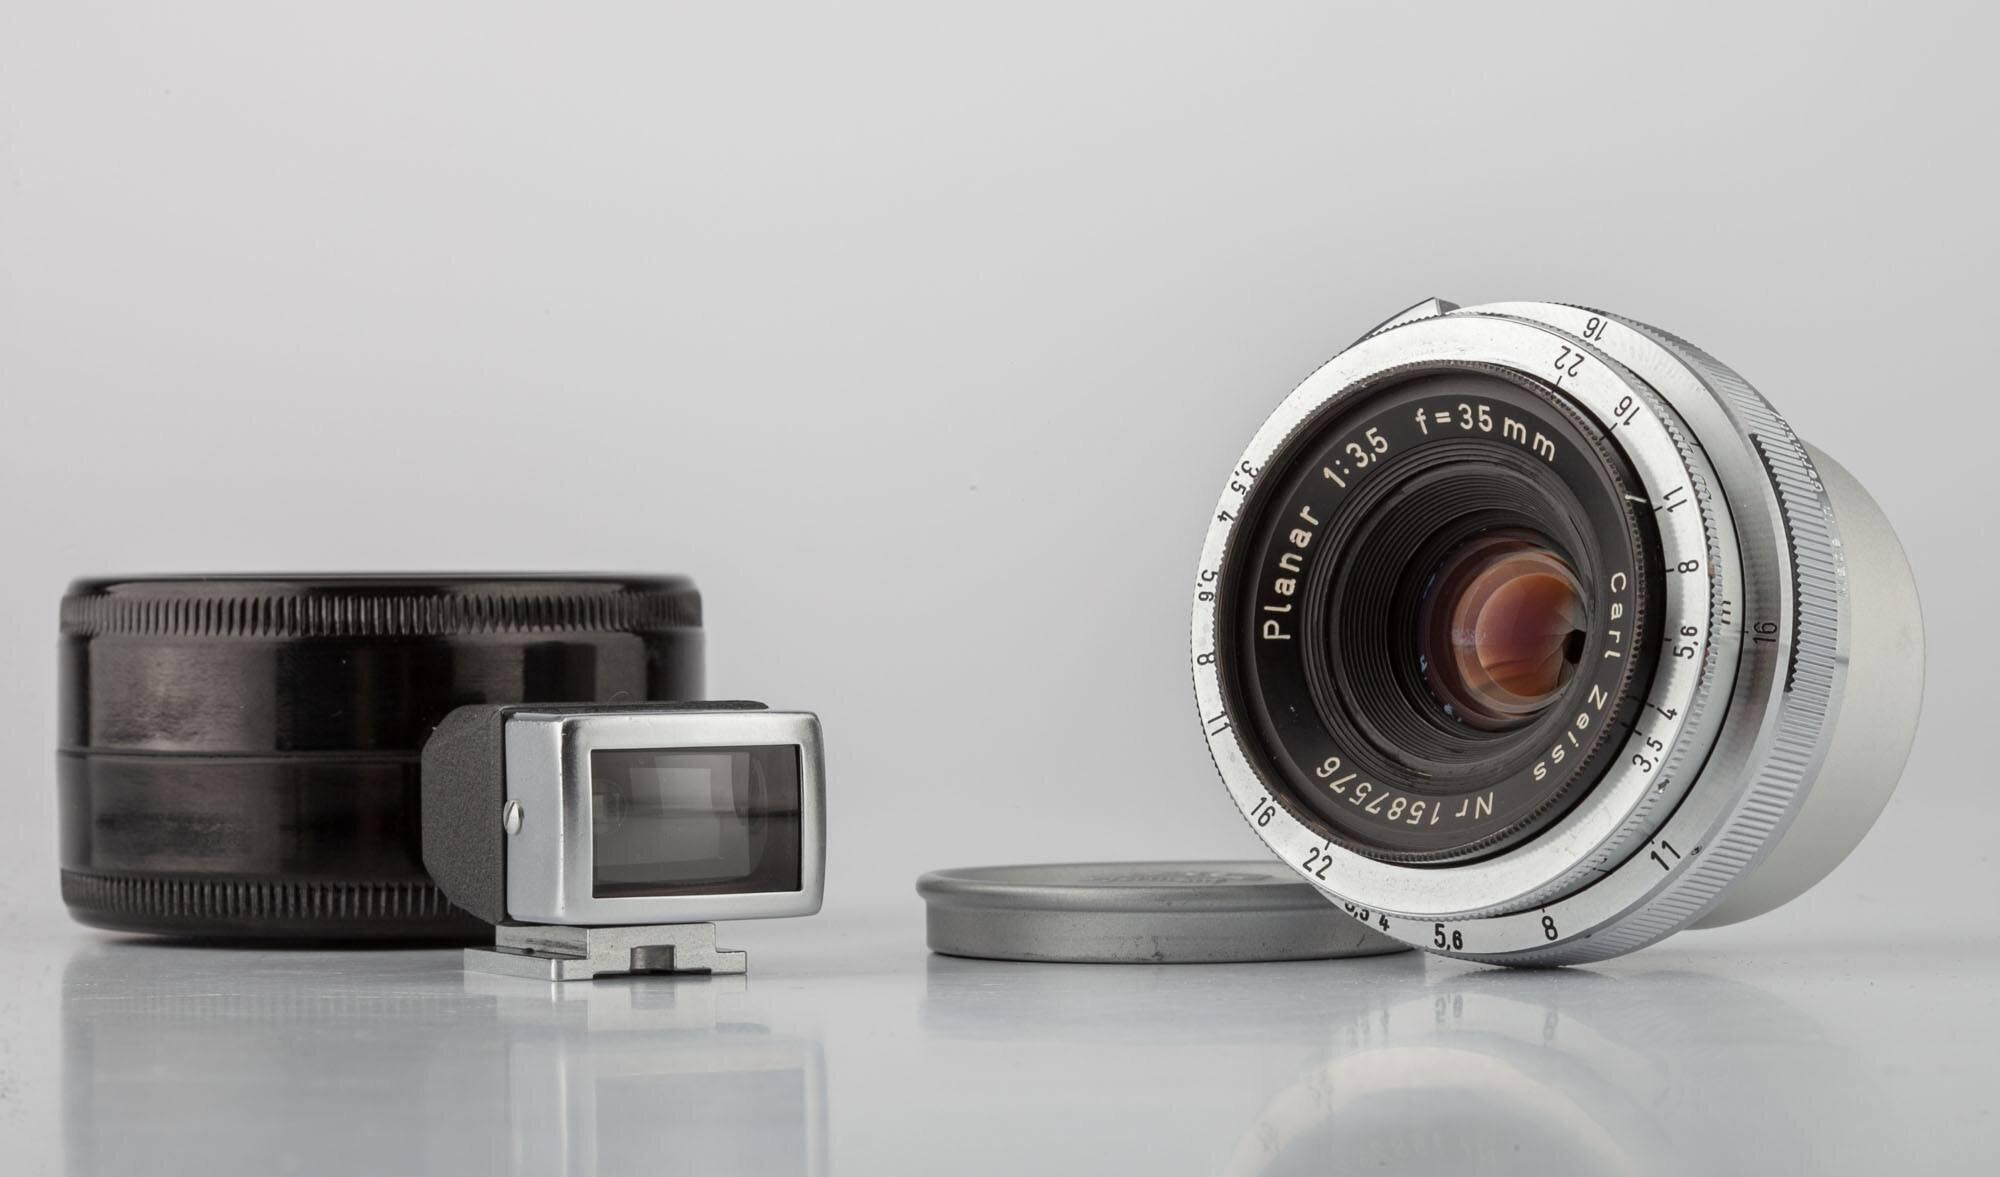 Carl Zeiss f. Contax RF + Planar 3,5/35mm + Sucher 432/5